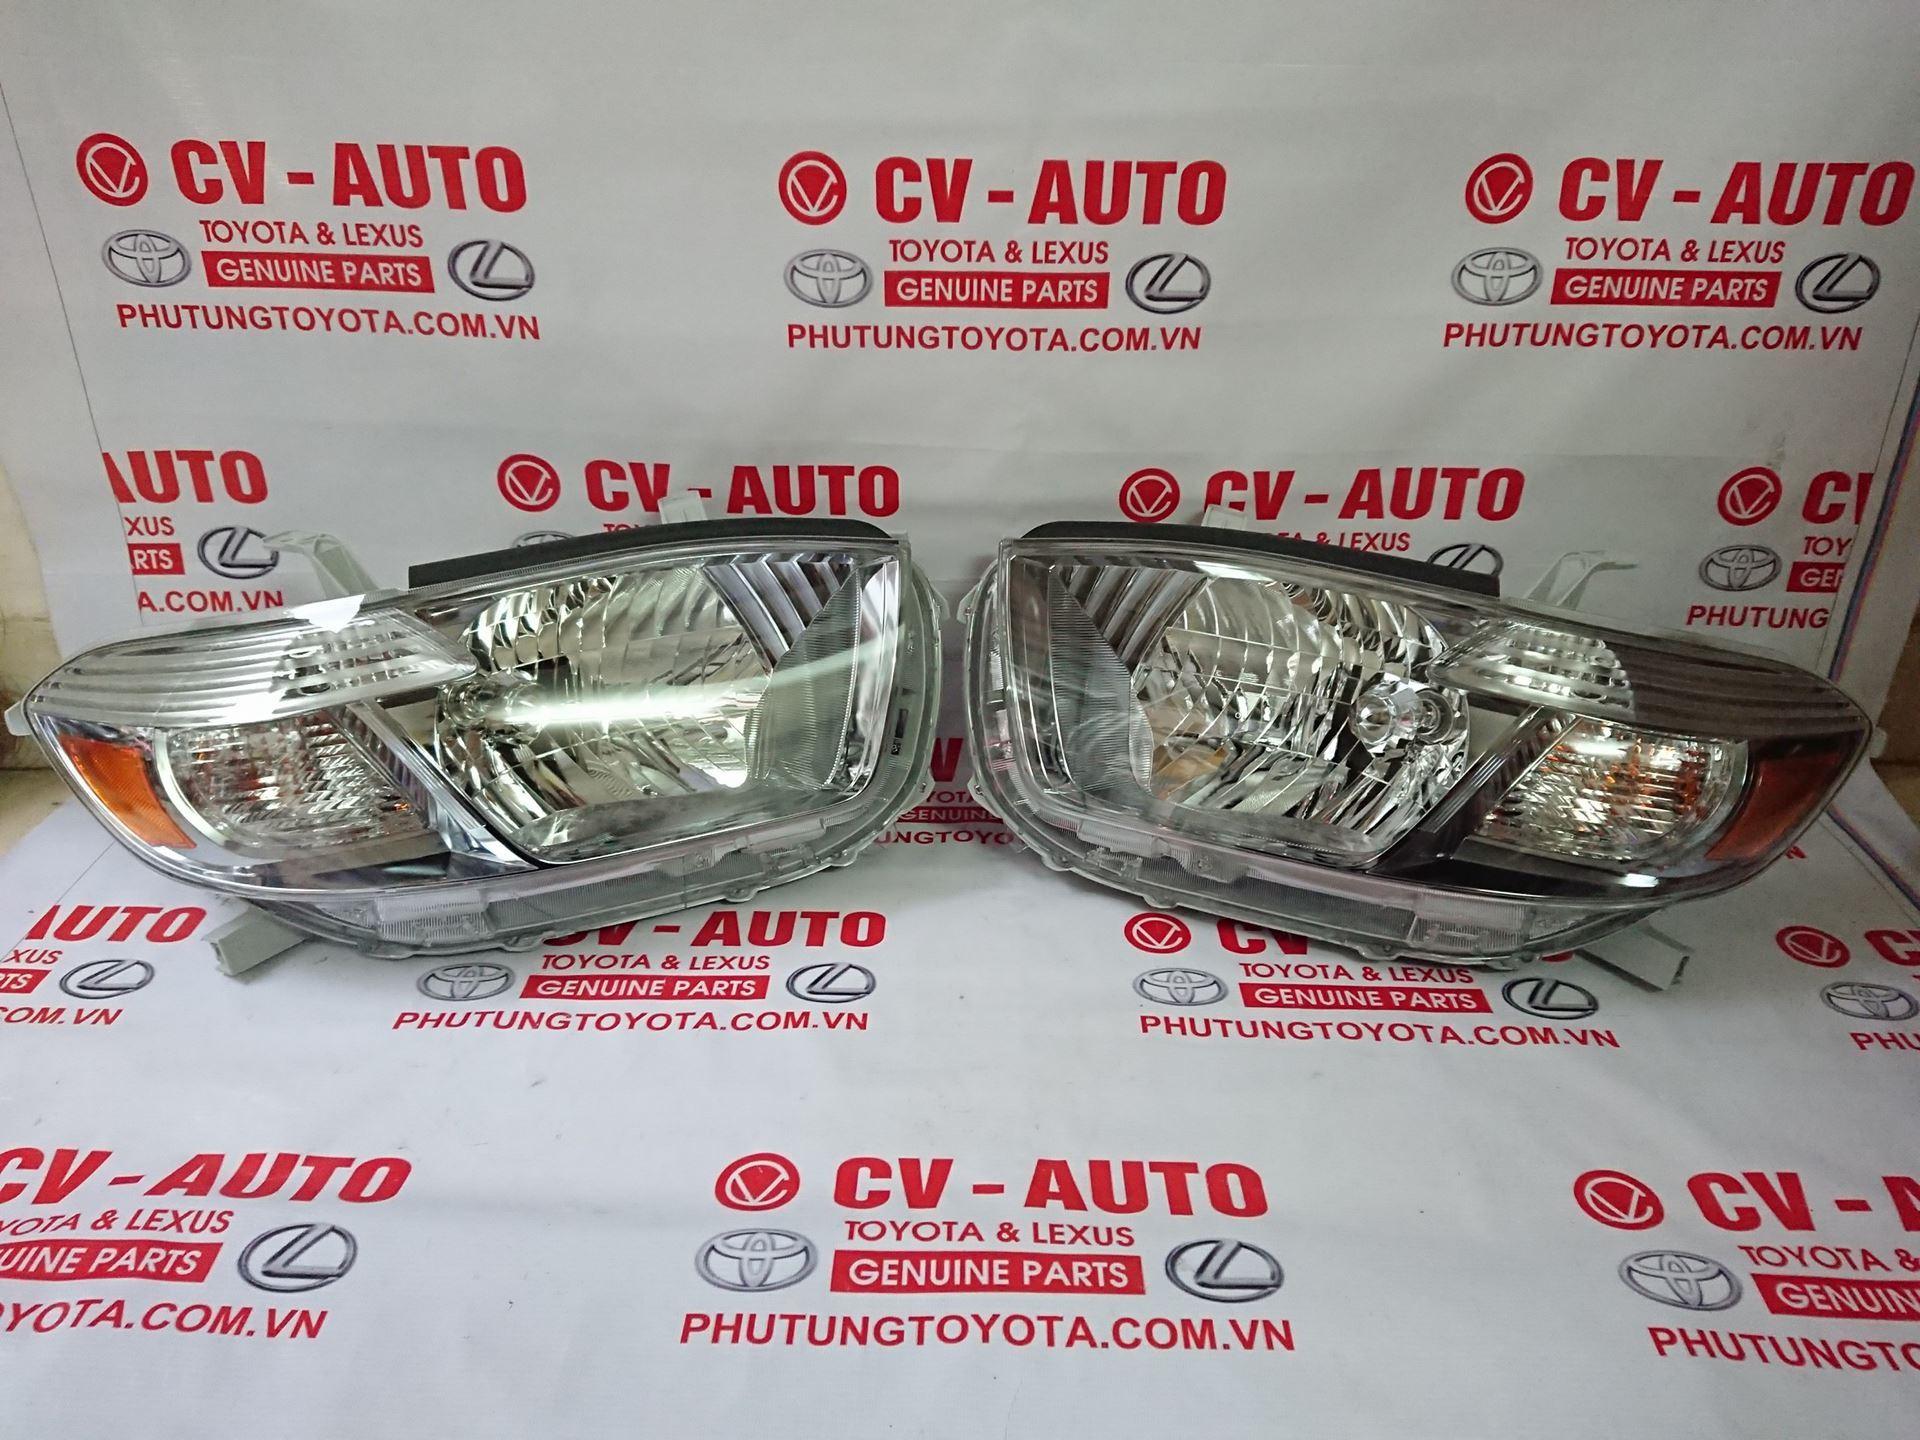 Picture of 81130-48470 81170-48460 Đèn pha trái, phải Toyota Highlander 2007-2010